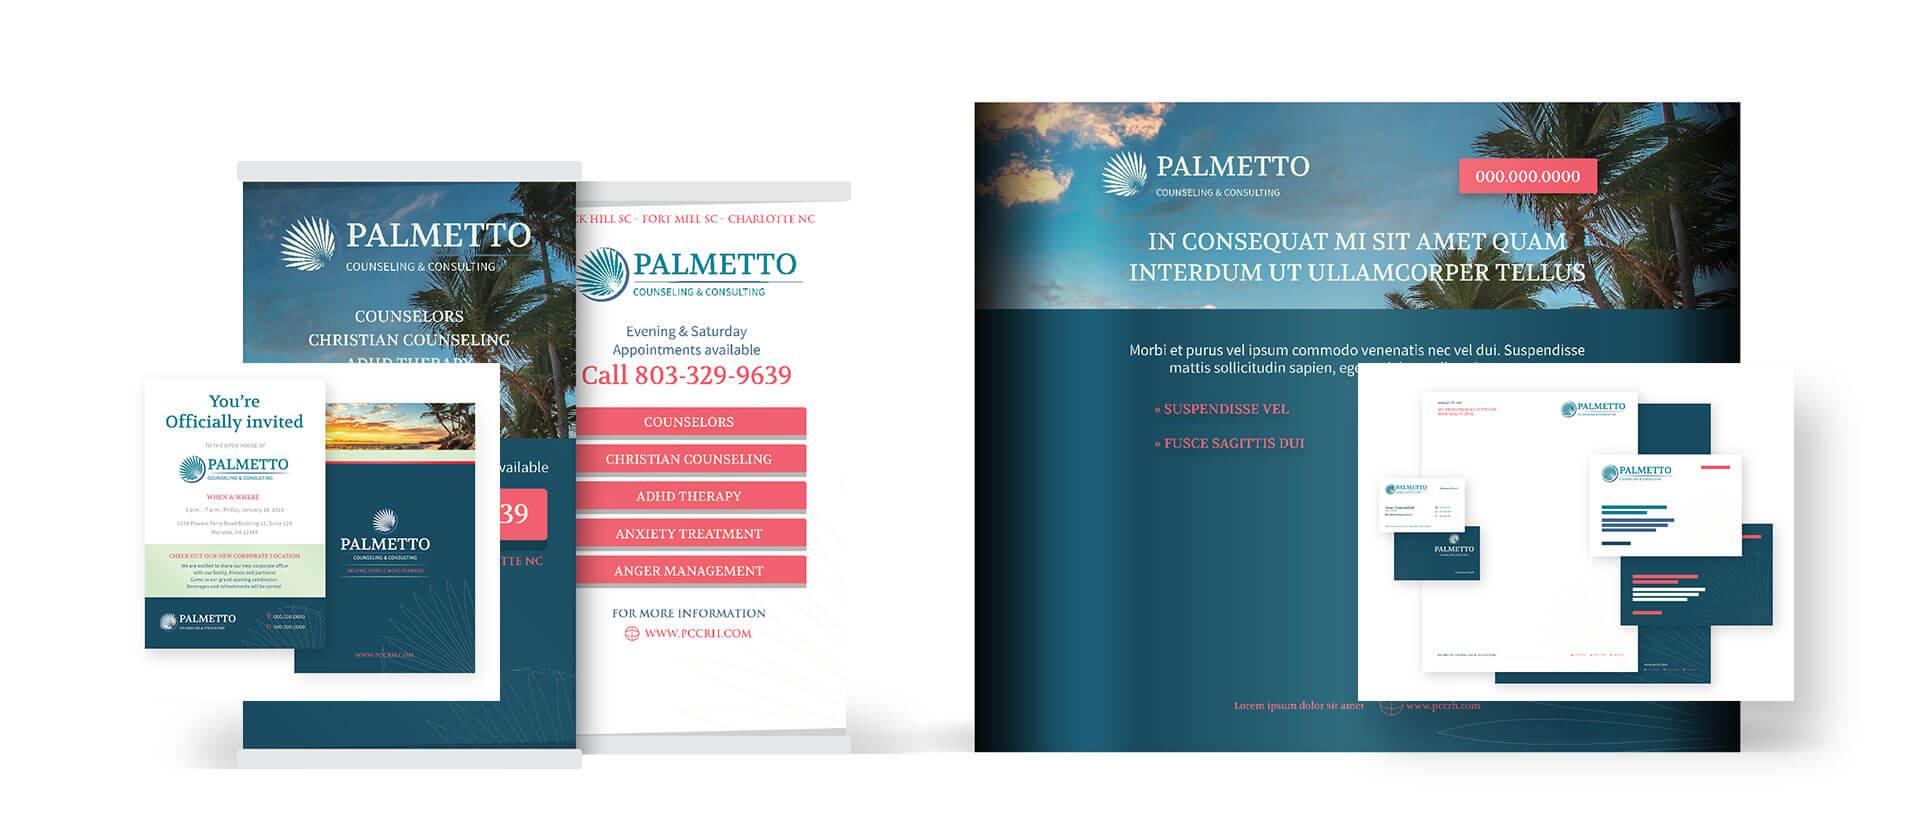 Talenalexander Portfolio Palmetto